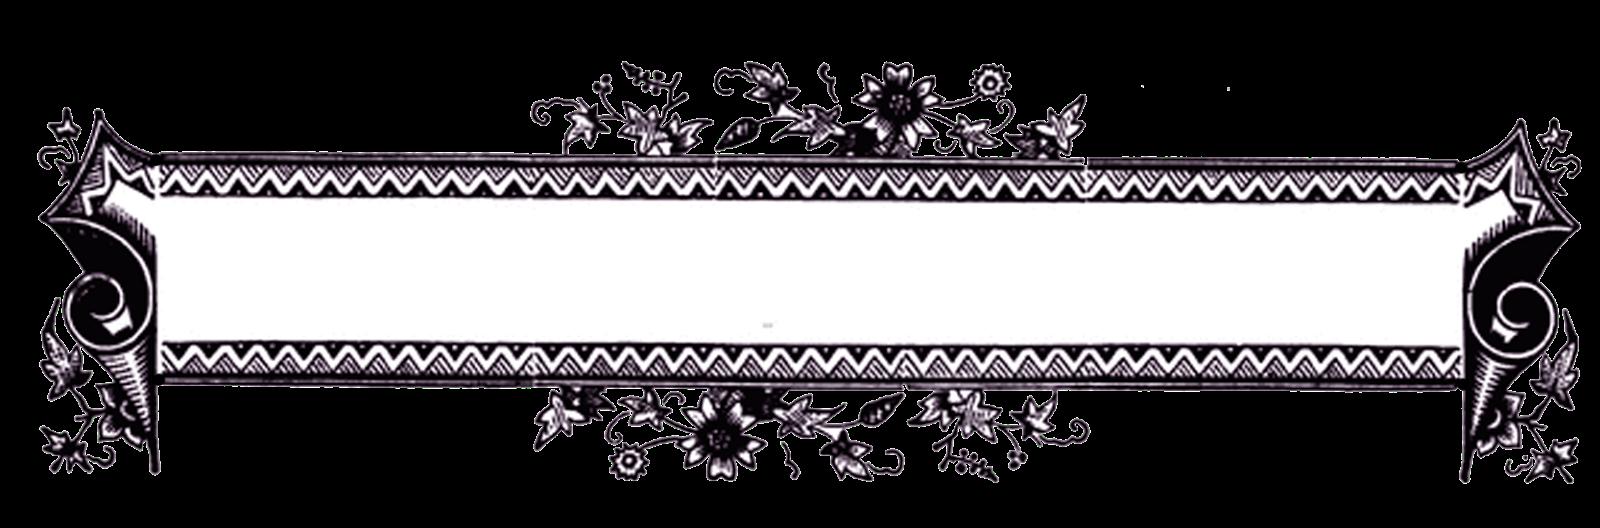 black vintage frame border - Google Search | Tags | Pinterest